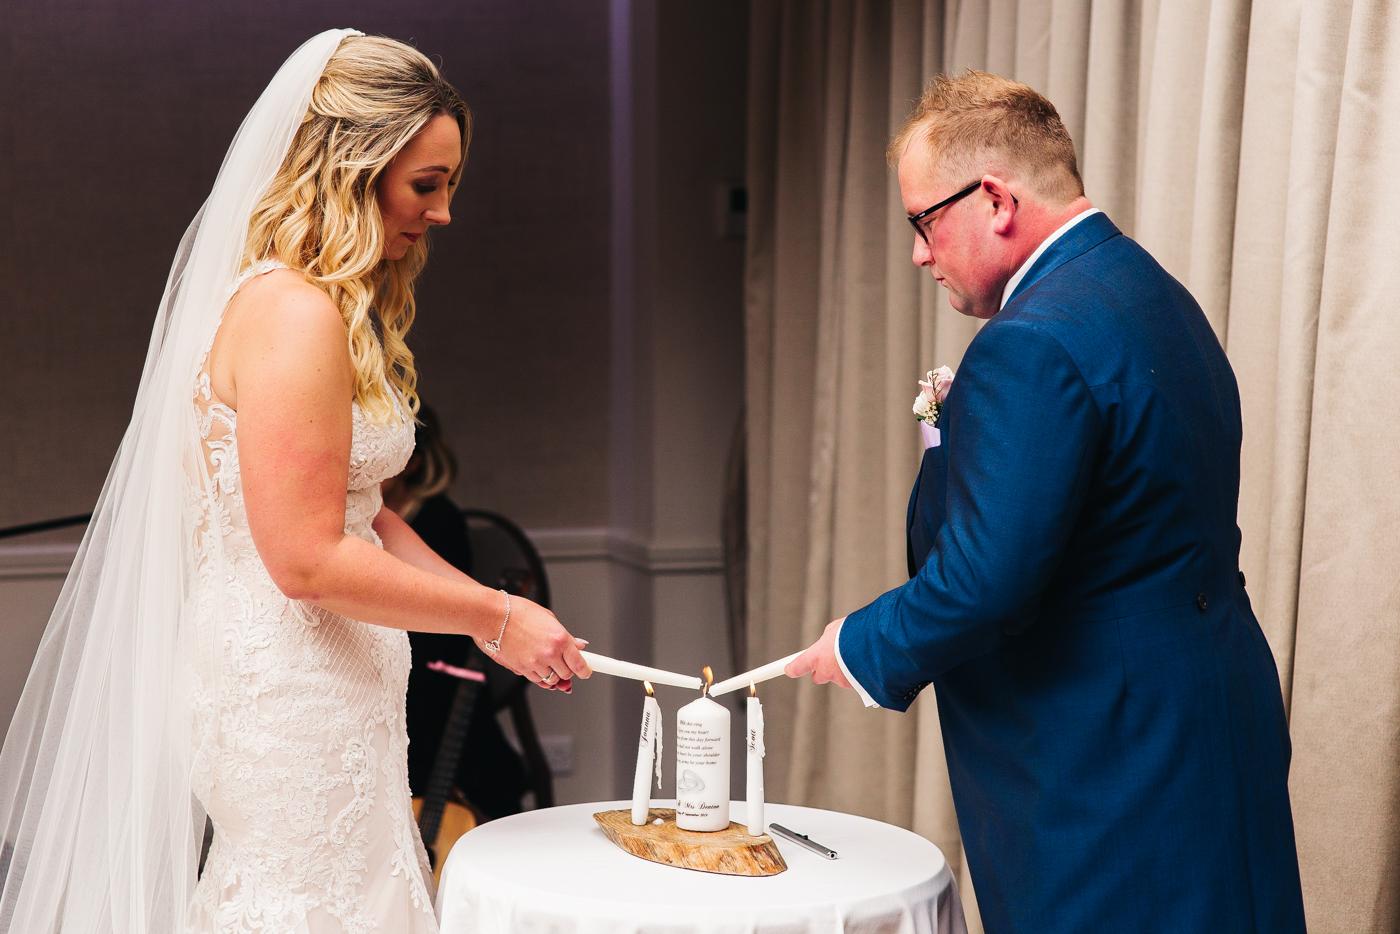 headlame-hall-north-yorkshire-north-east-photographer-wedding-0022.jpg